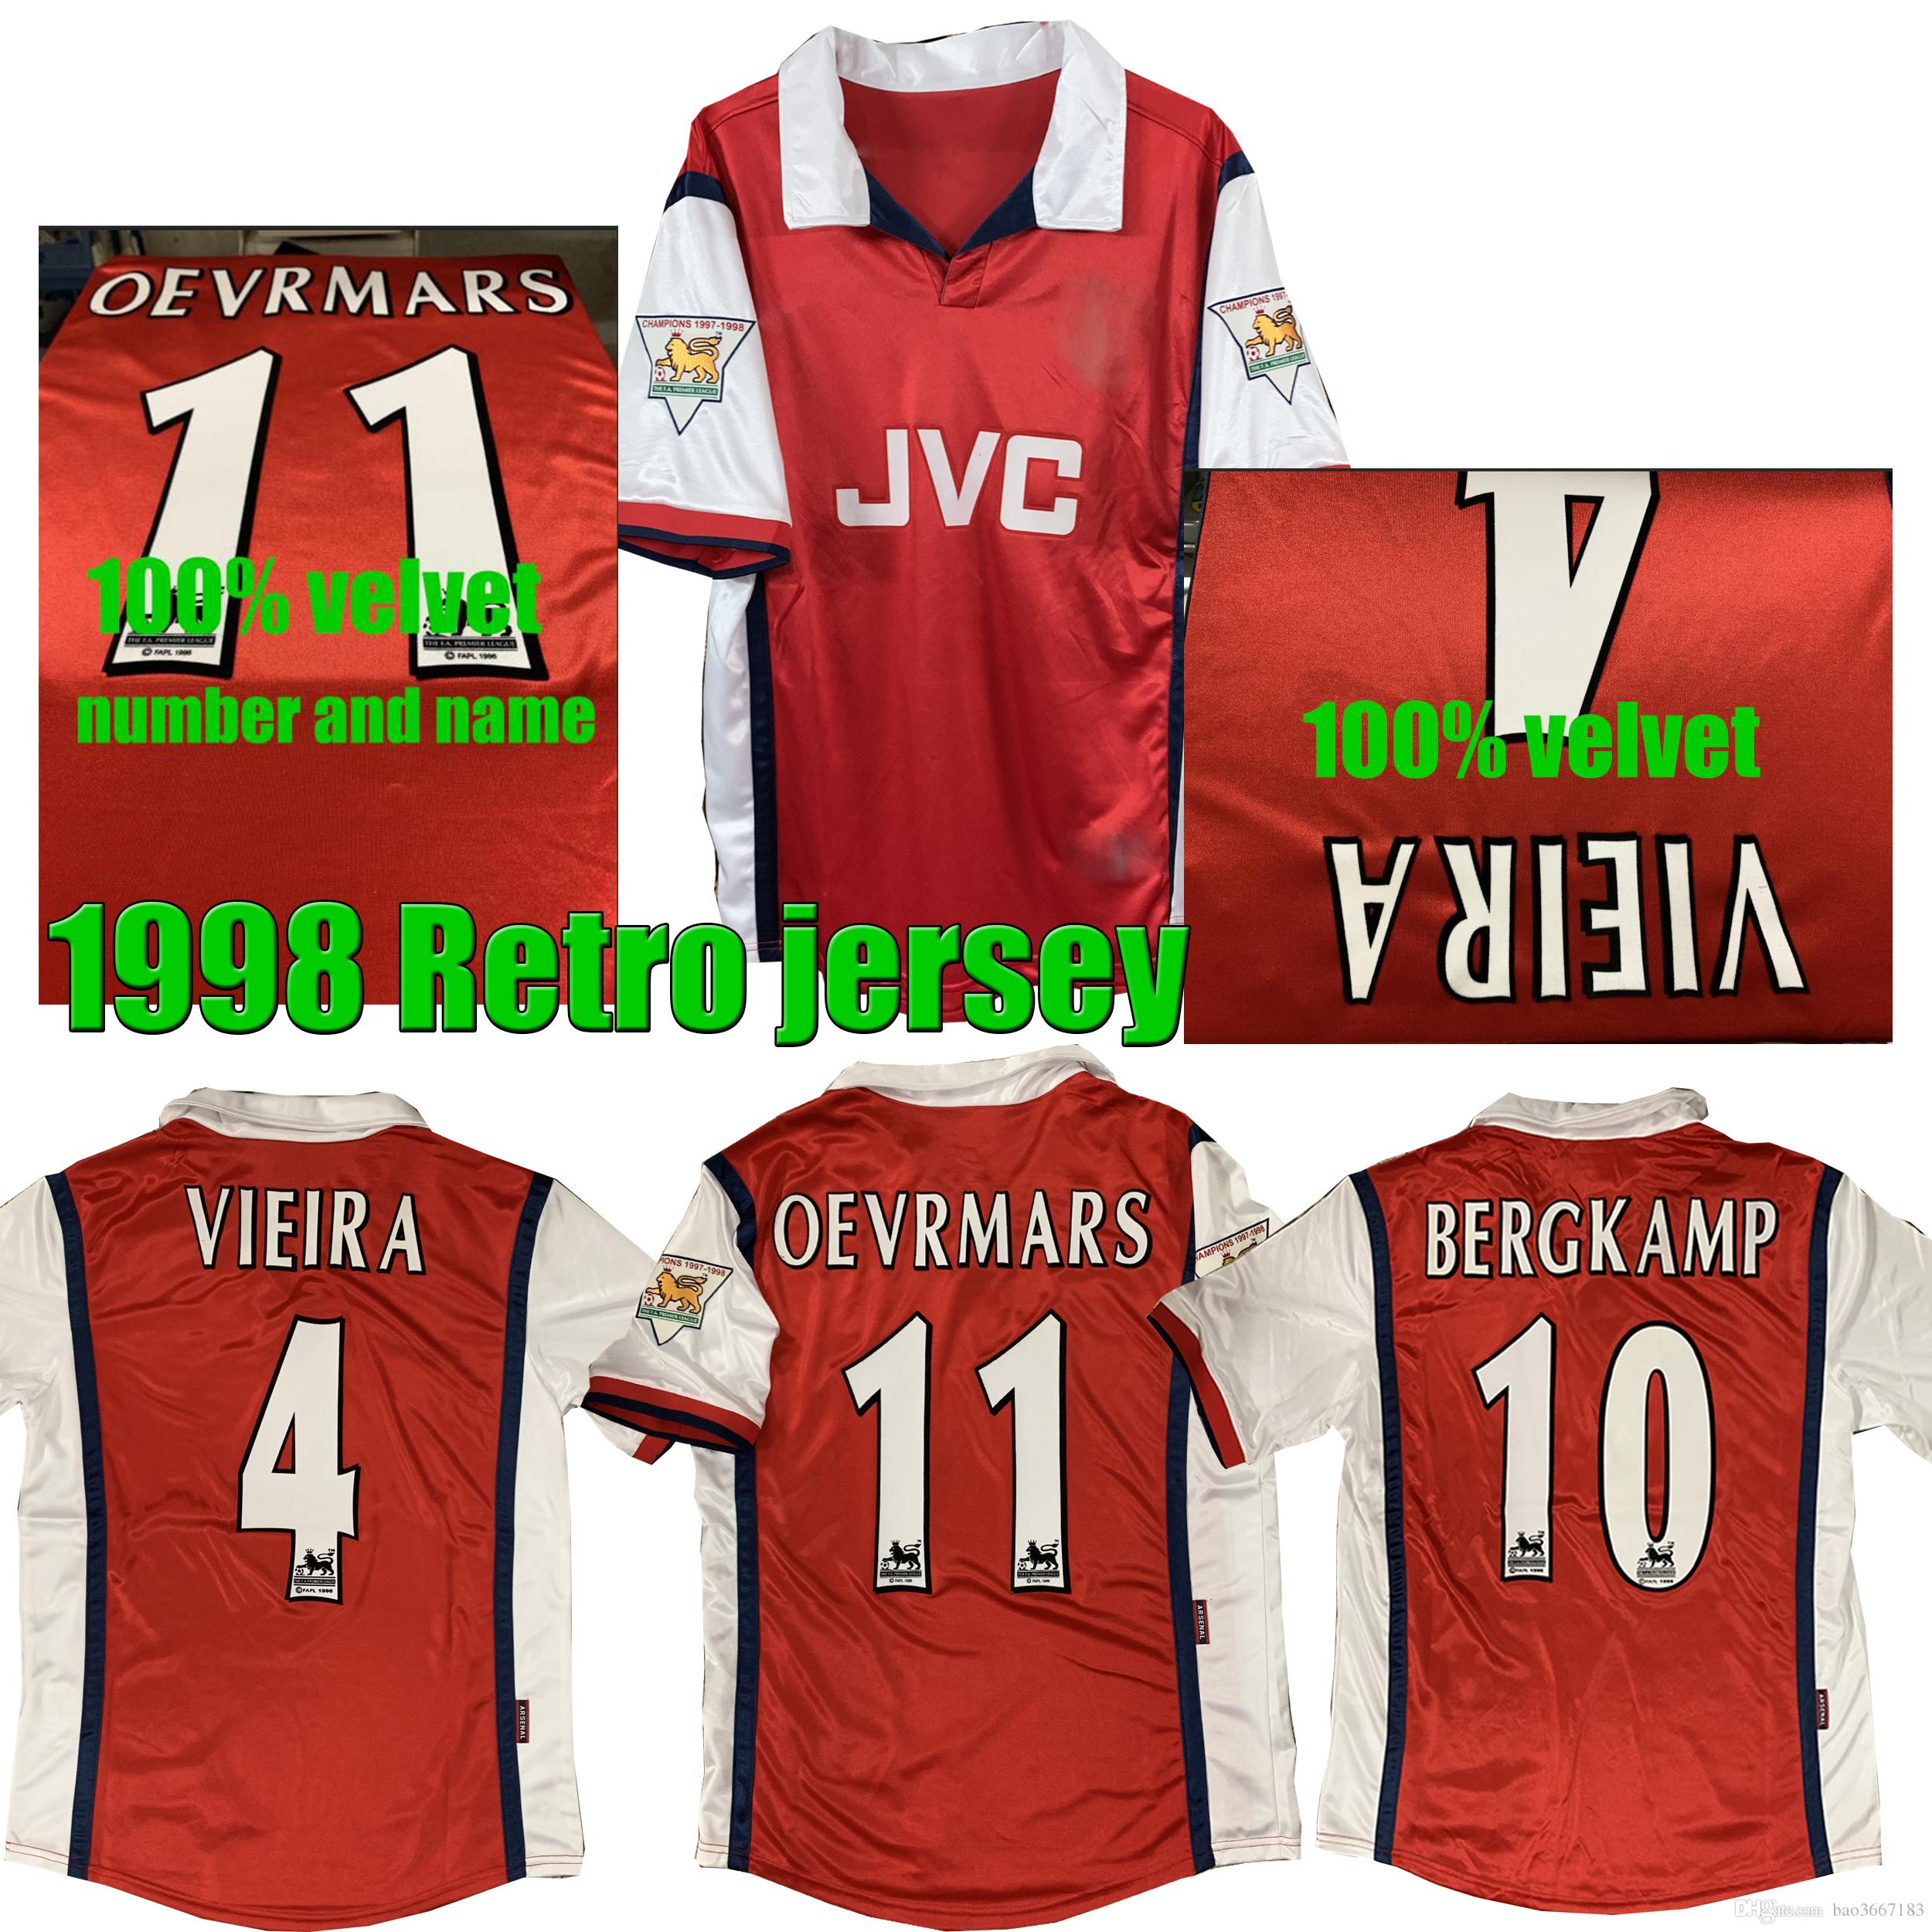 8393fce32 2019 1998 BERGKAMP VIEIRA Retro Soccer Jersey Bergkamp Anelka OEVRMARS 1998  Legendary Retro Football Shirt From Bao3667183